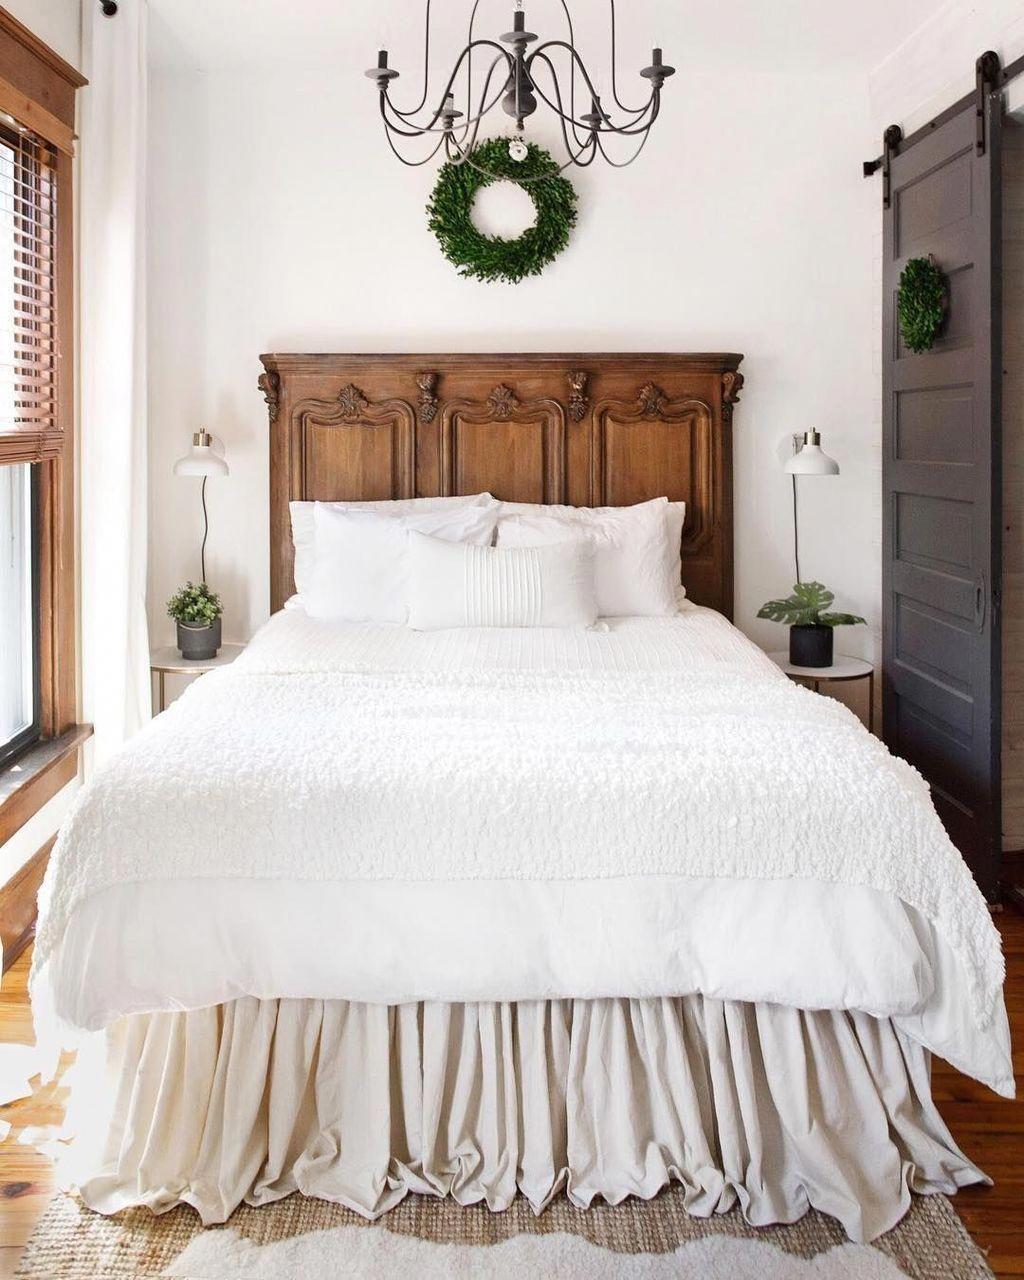 Stunning 38 Cool Urban Farmhouse Master Bedroom Ideas. #rusticmasterbedroom#bedr...#bedroom #cool #farmhouse #ideas #master #rusticmasterbedroombedr #stunning #urban